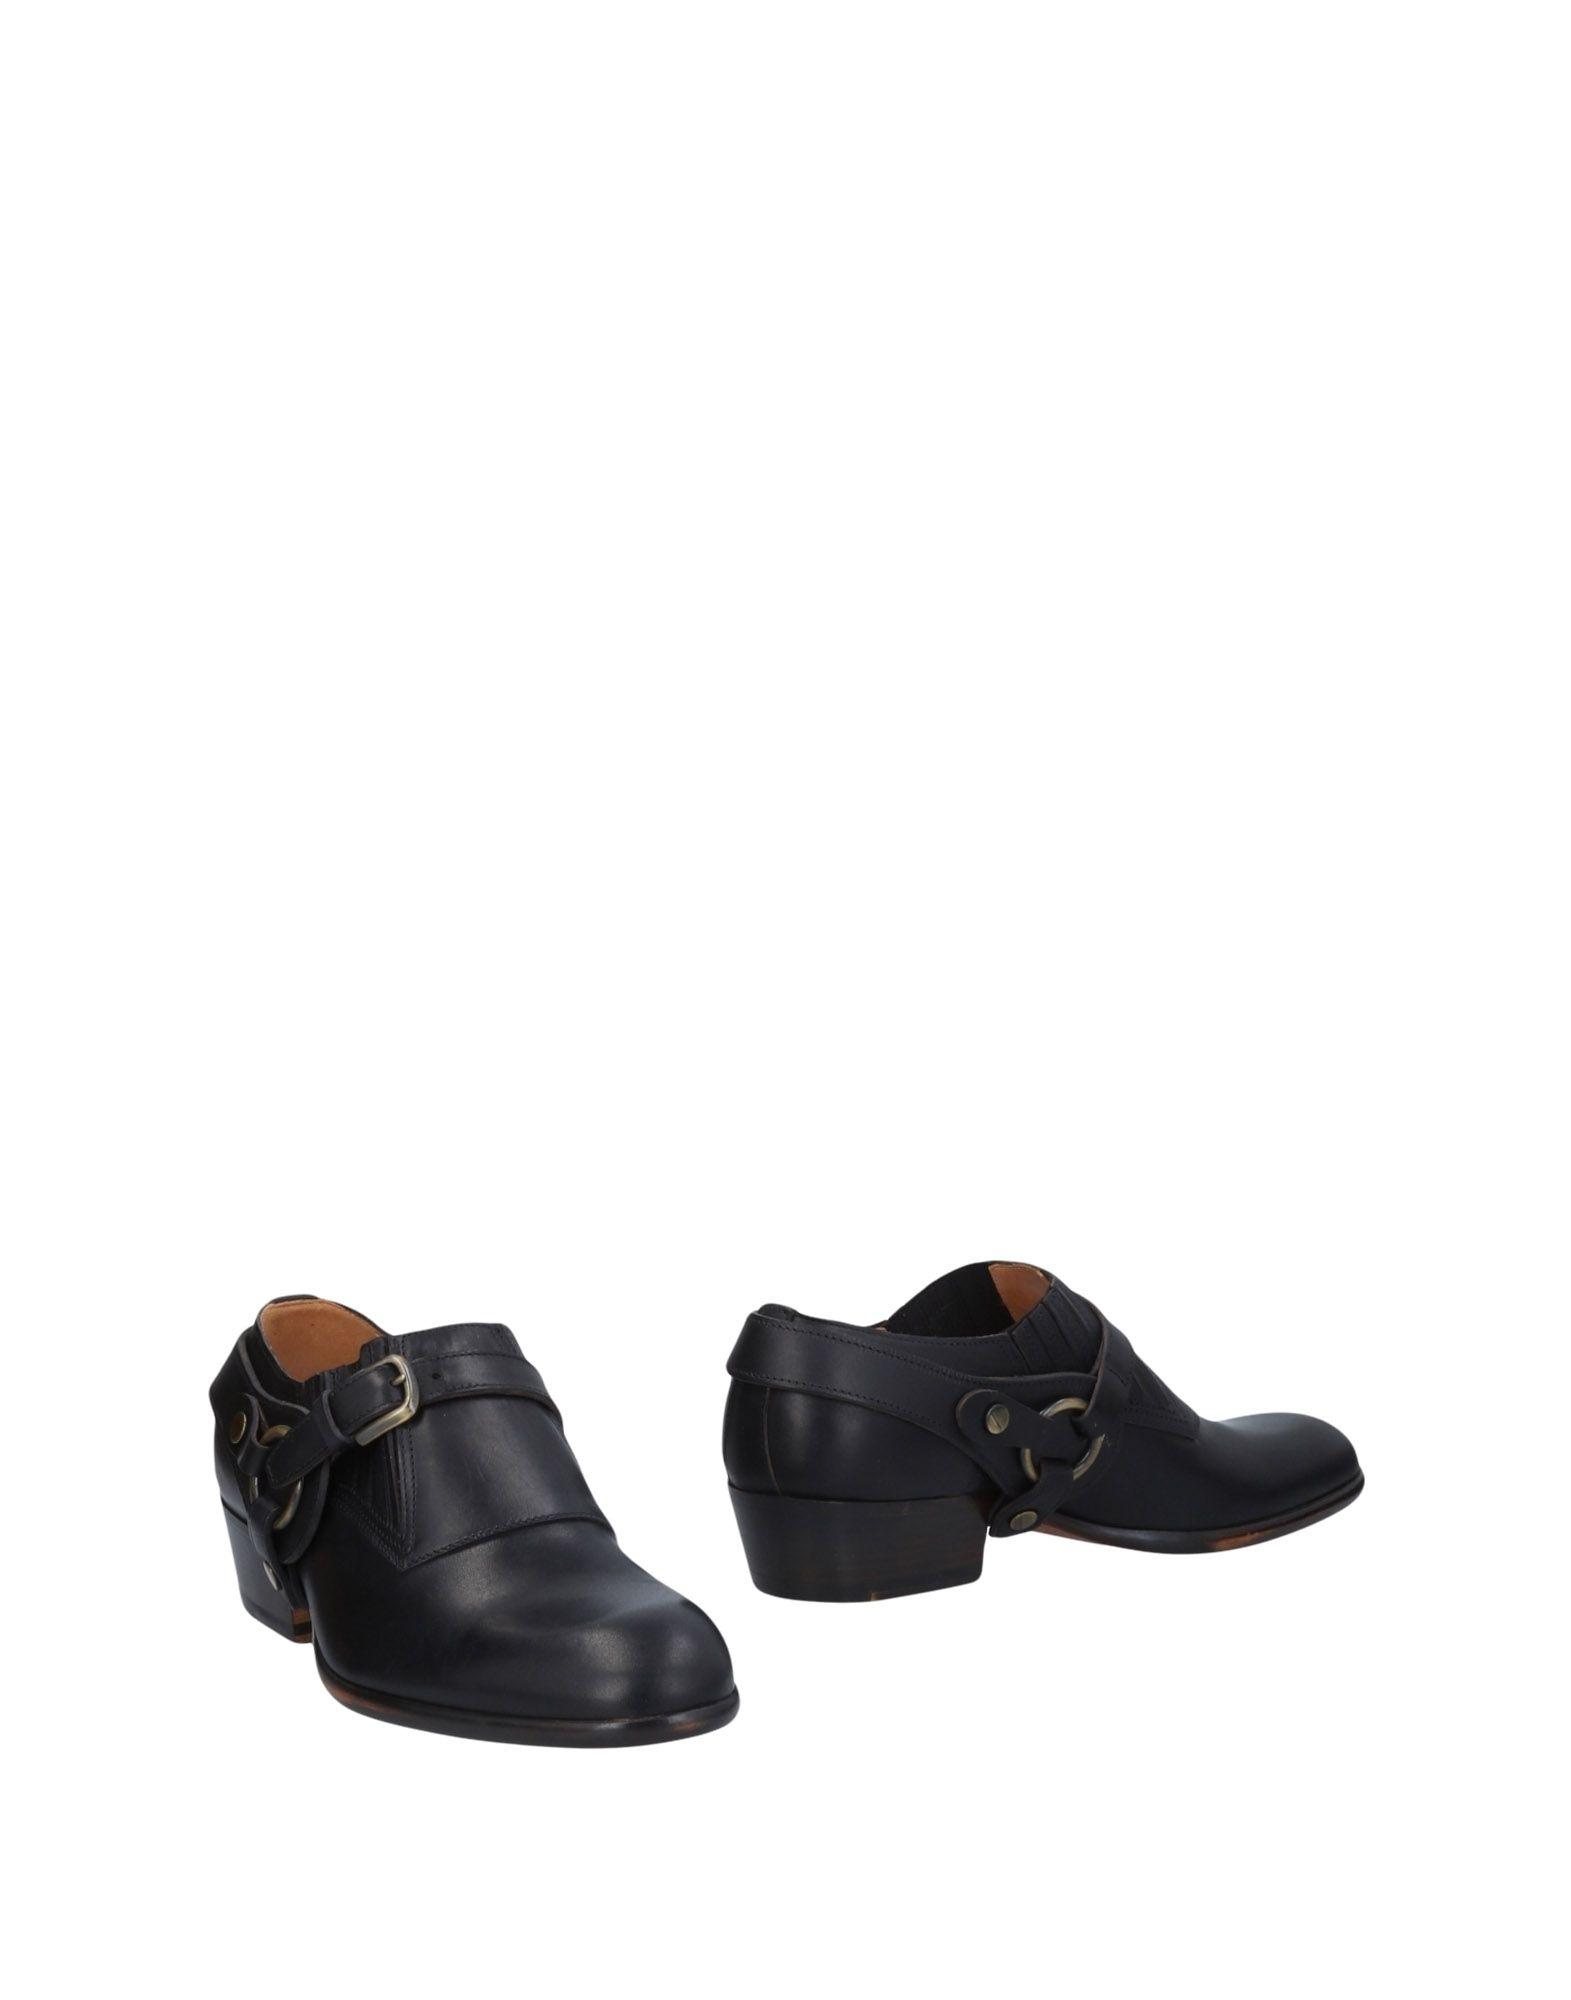 Maison Margiela Stiefelette Herren  Schuhe 11114977TB Gute Qualität beliebte Schuhe  d3ea5d